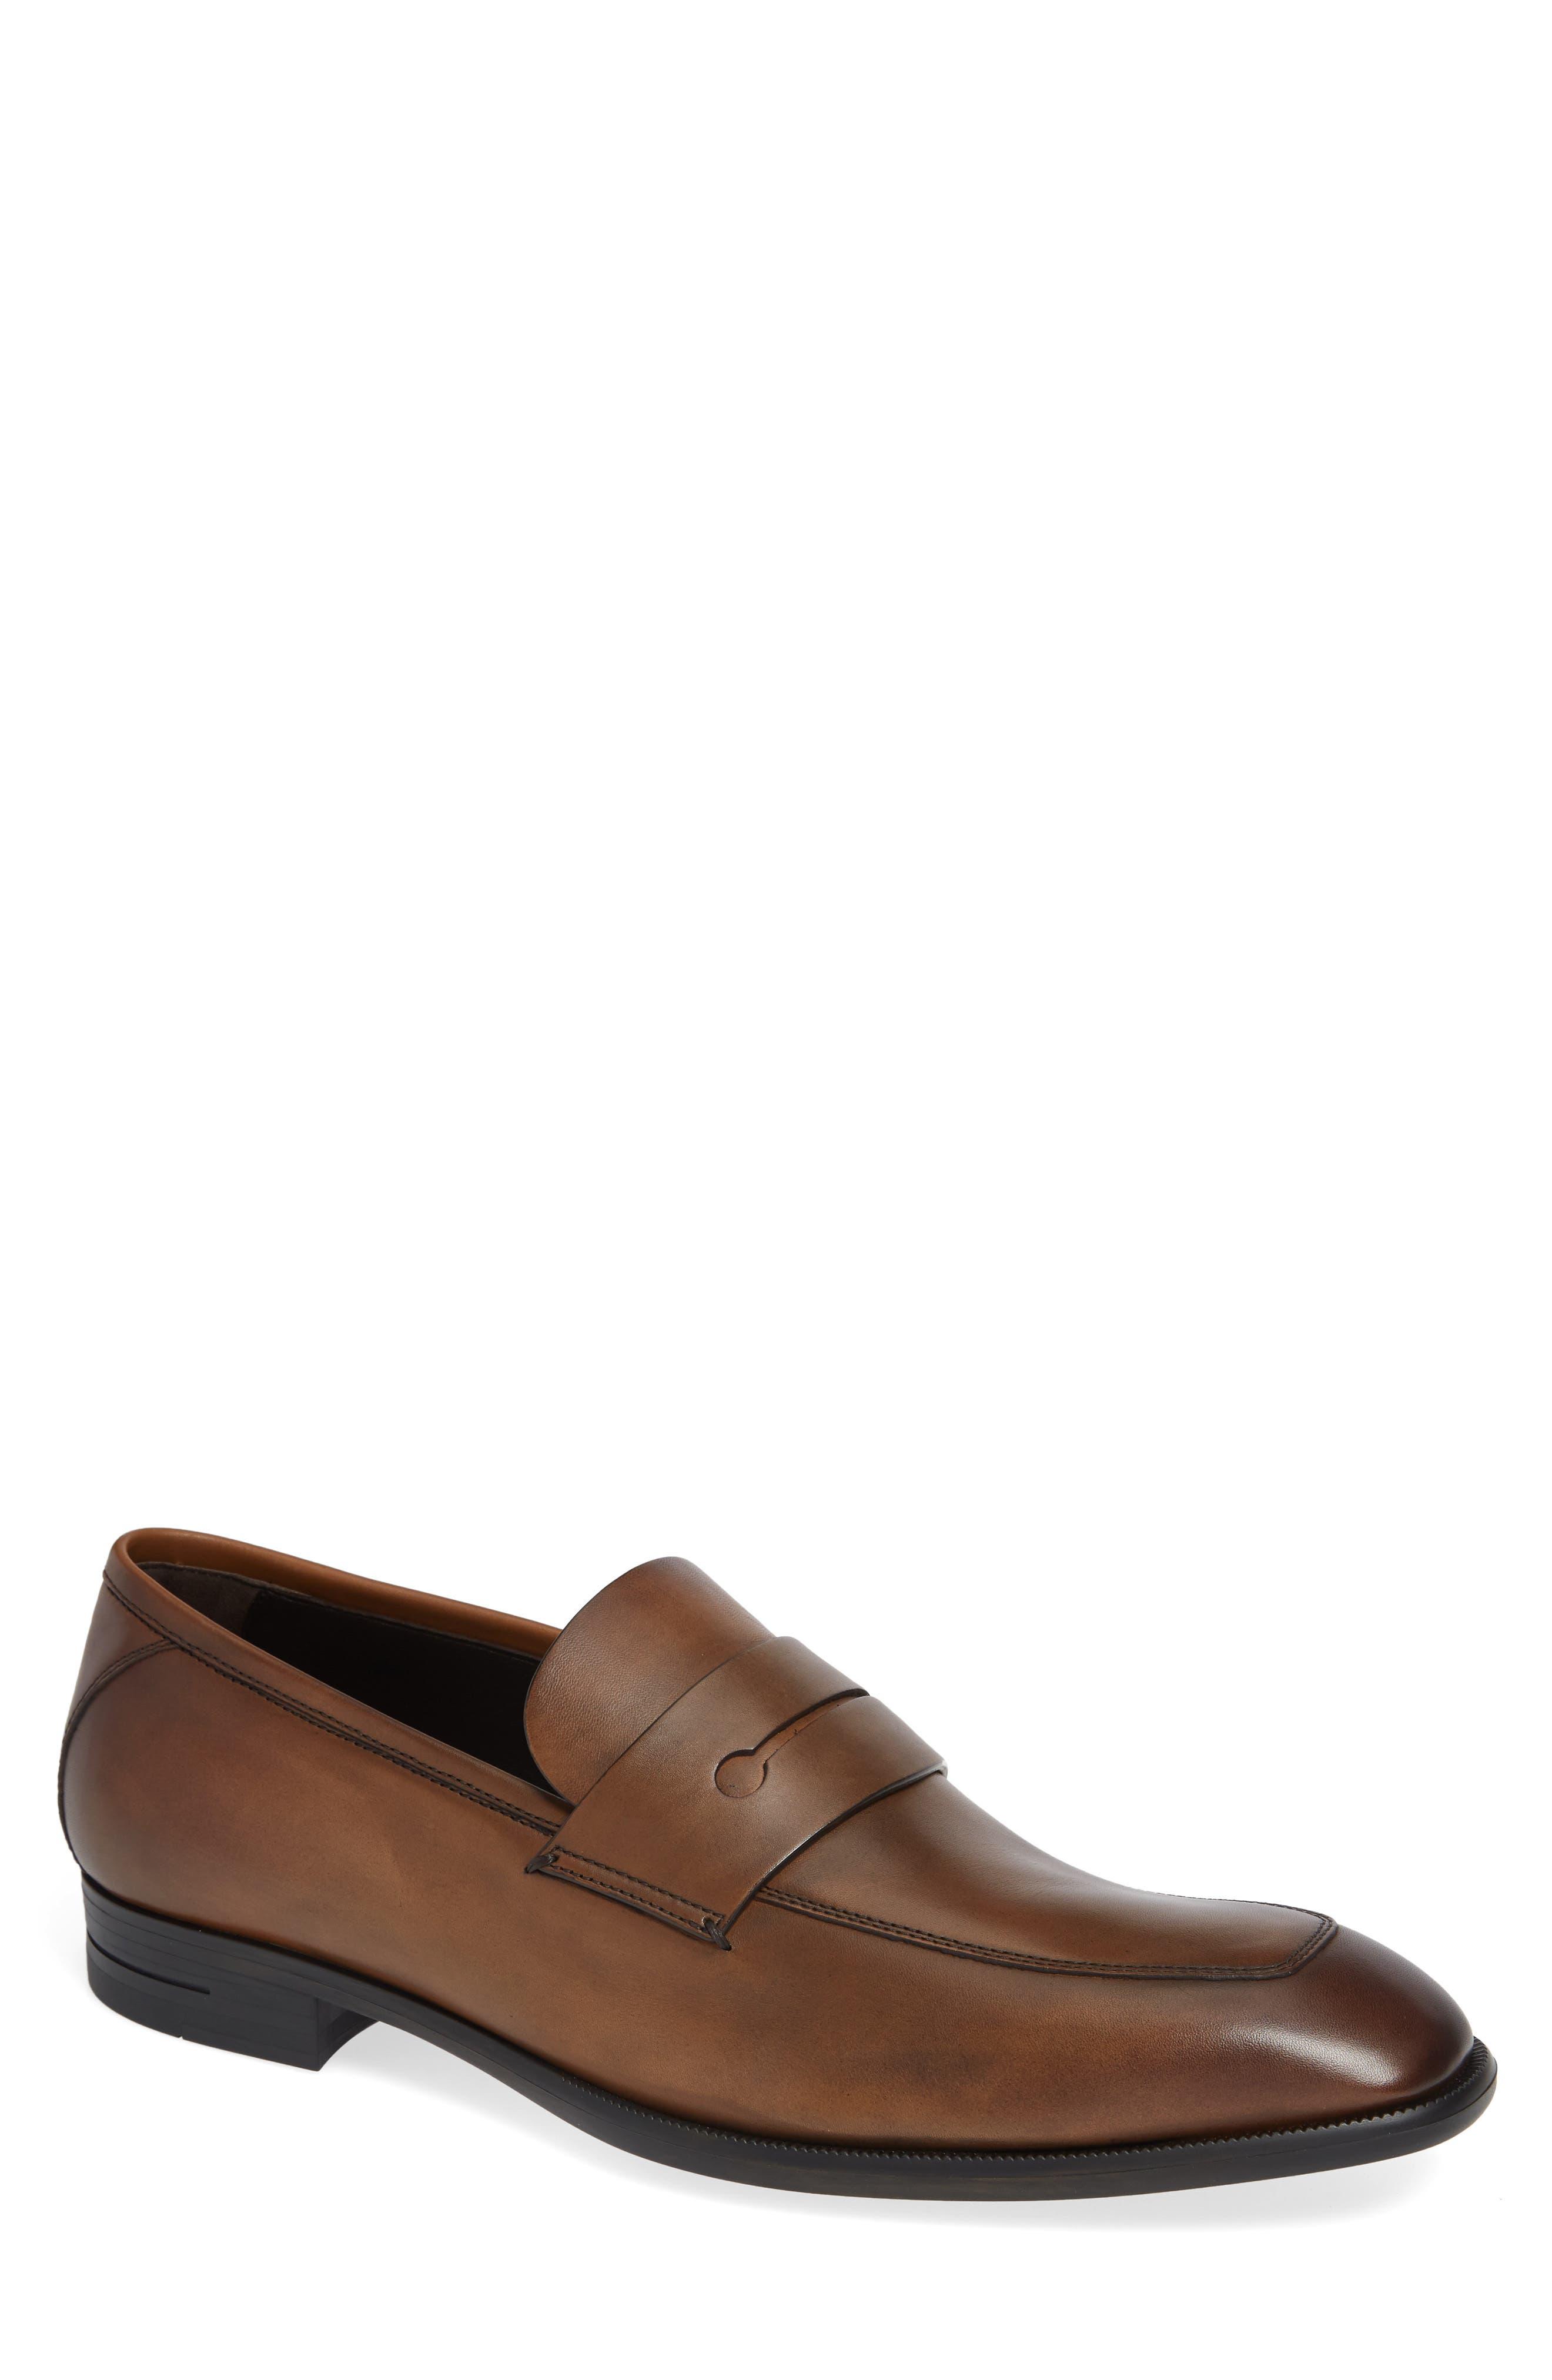 Men'S New Flex Leather Penny Loafer in Chestnut